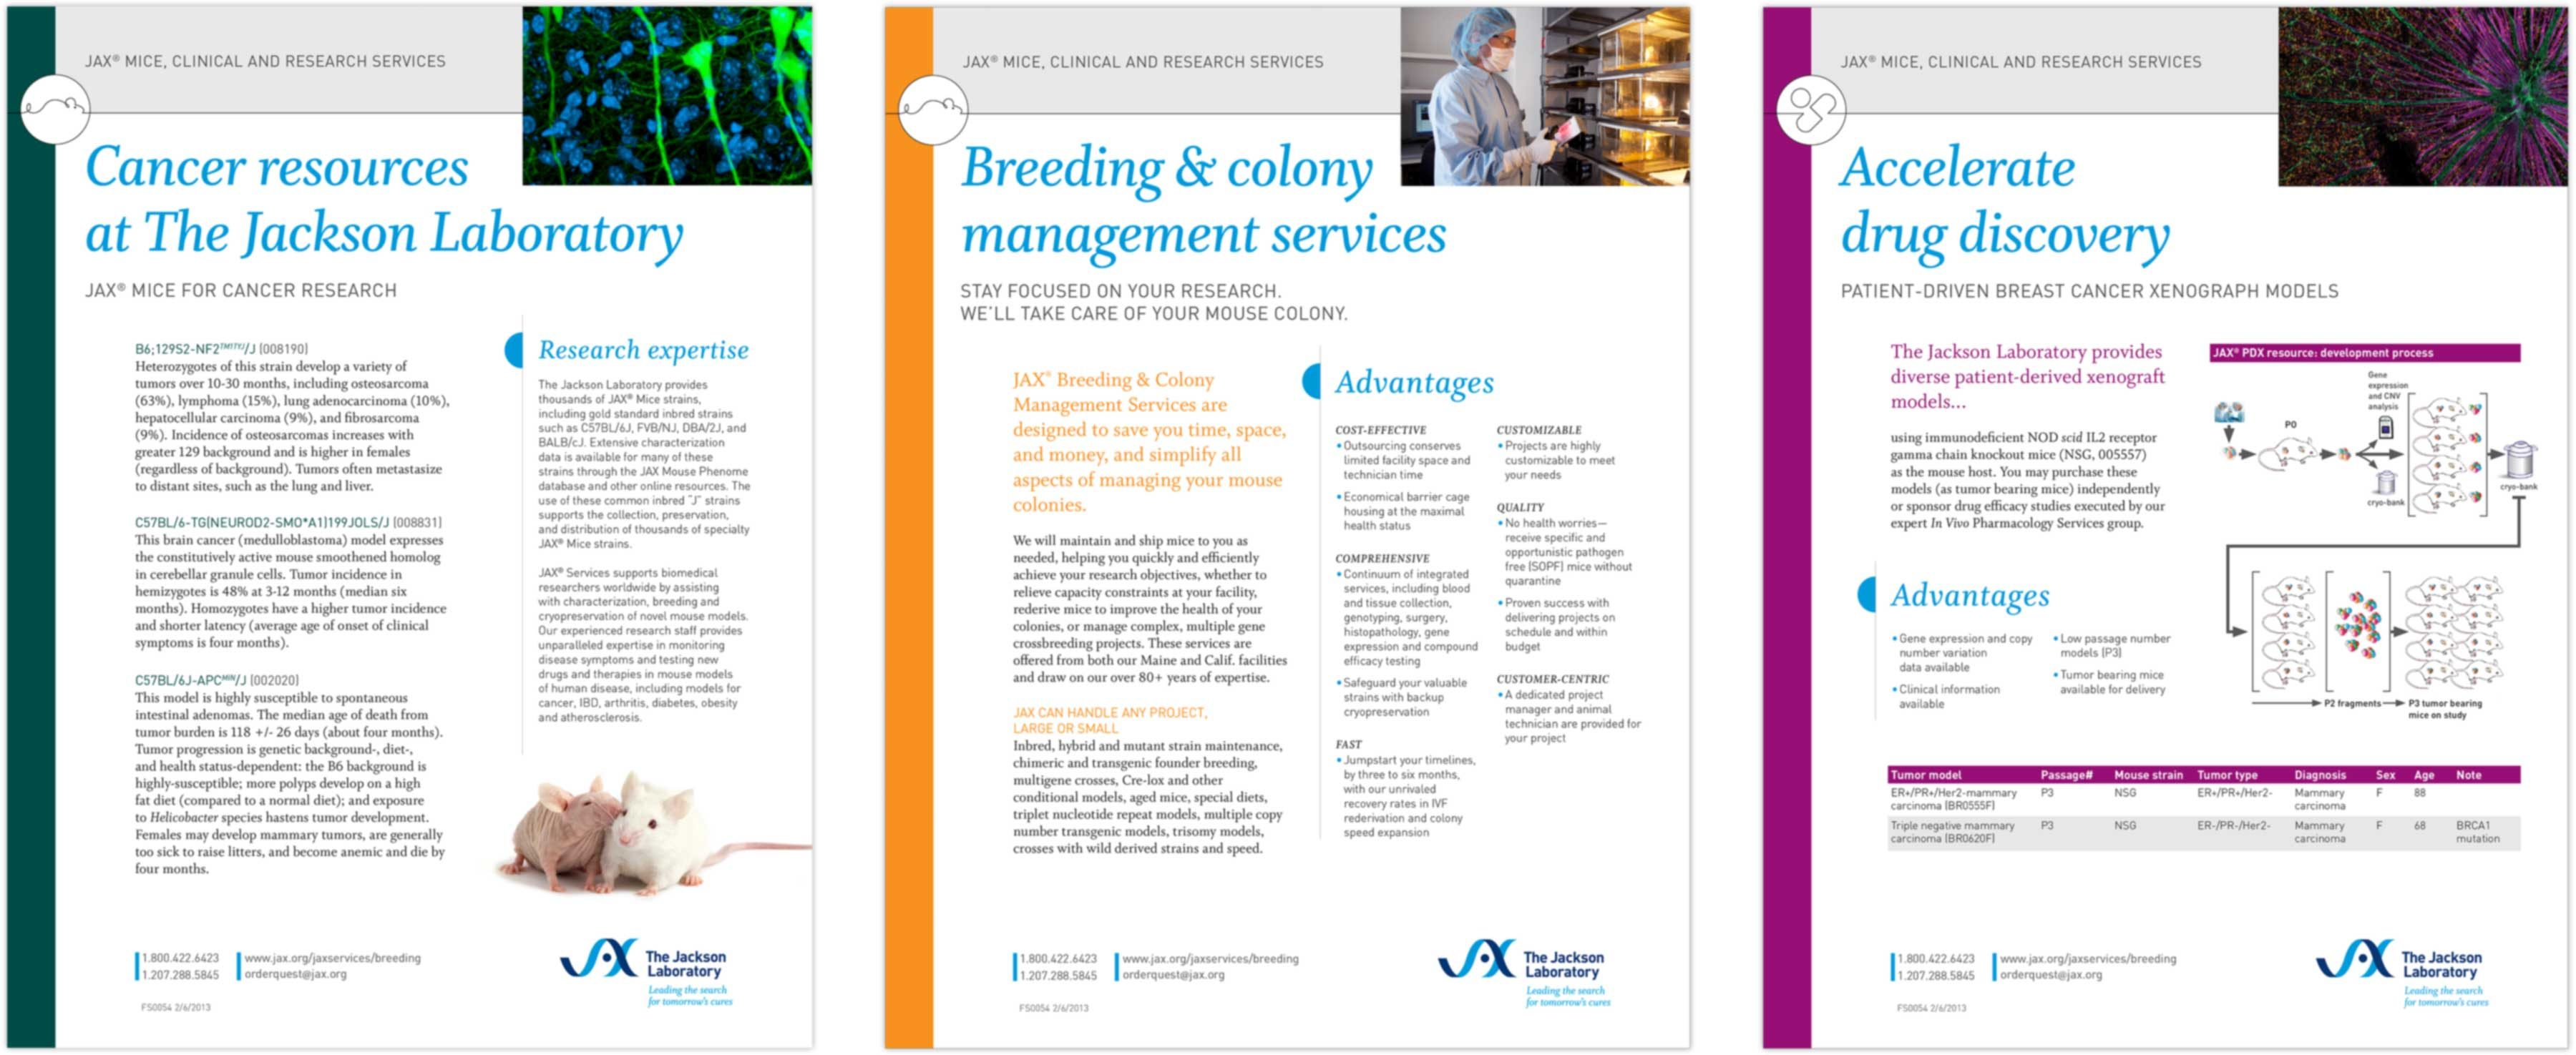 The Jackson Laboratory factsheet